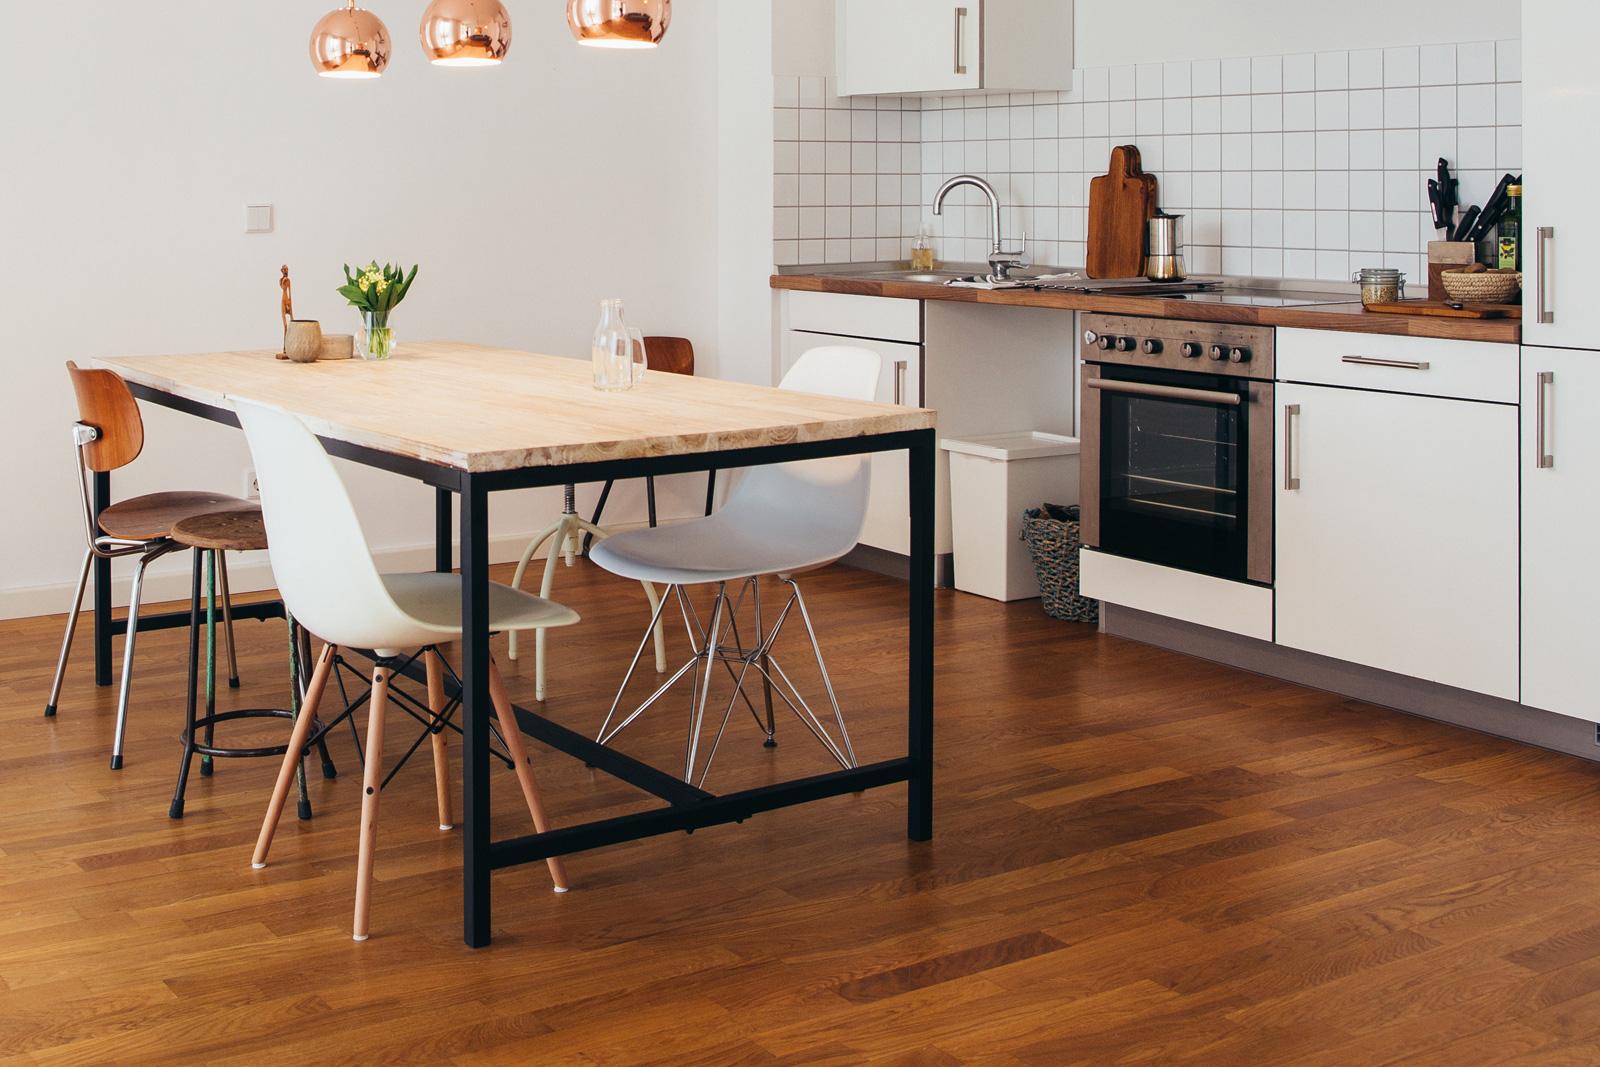 kitchen flooring options kitchen floors | best kitchen flooring materials | houselogic UHGZQHK